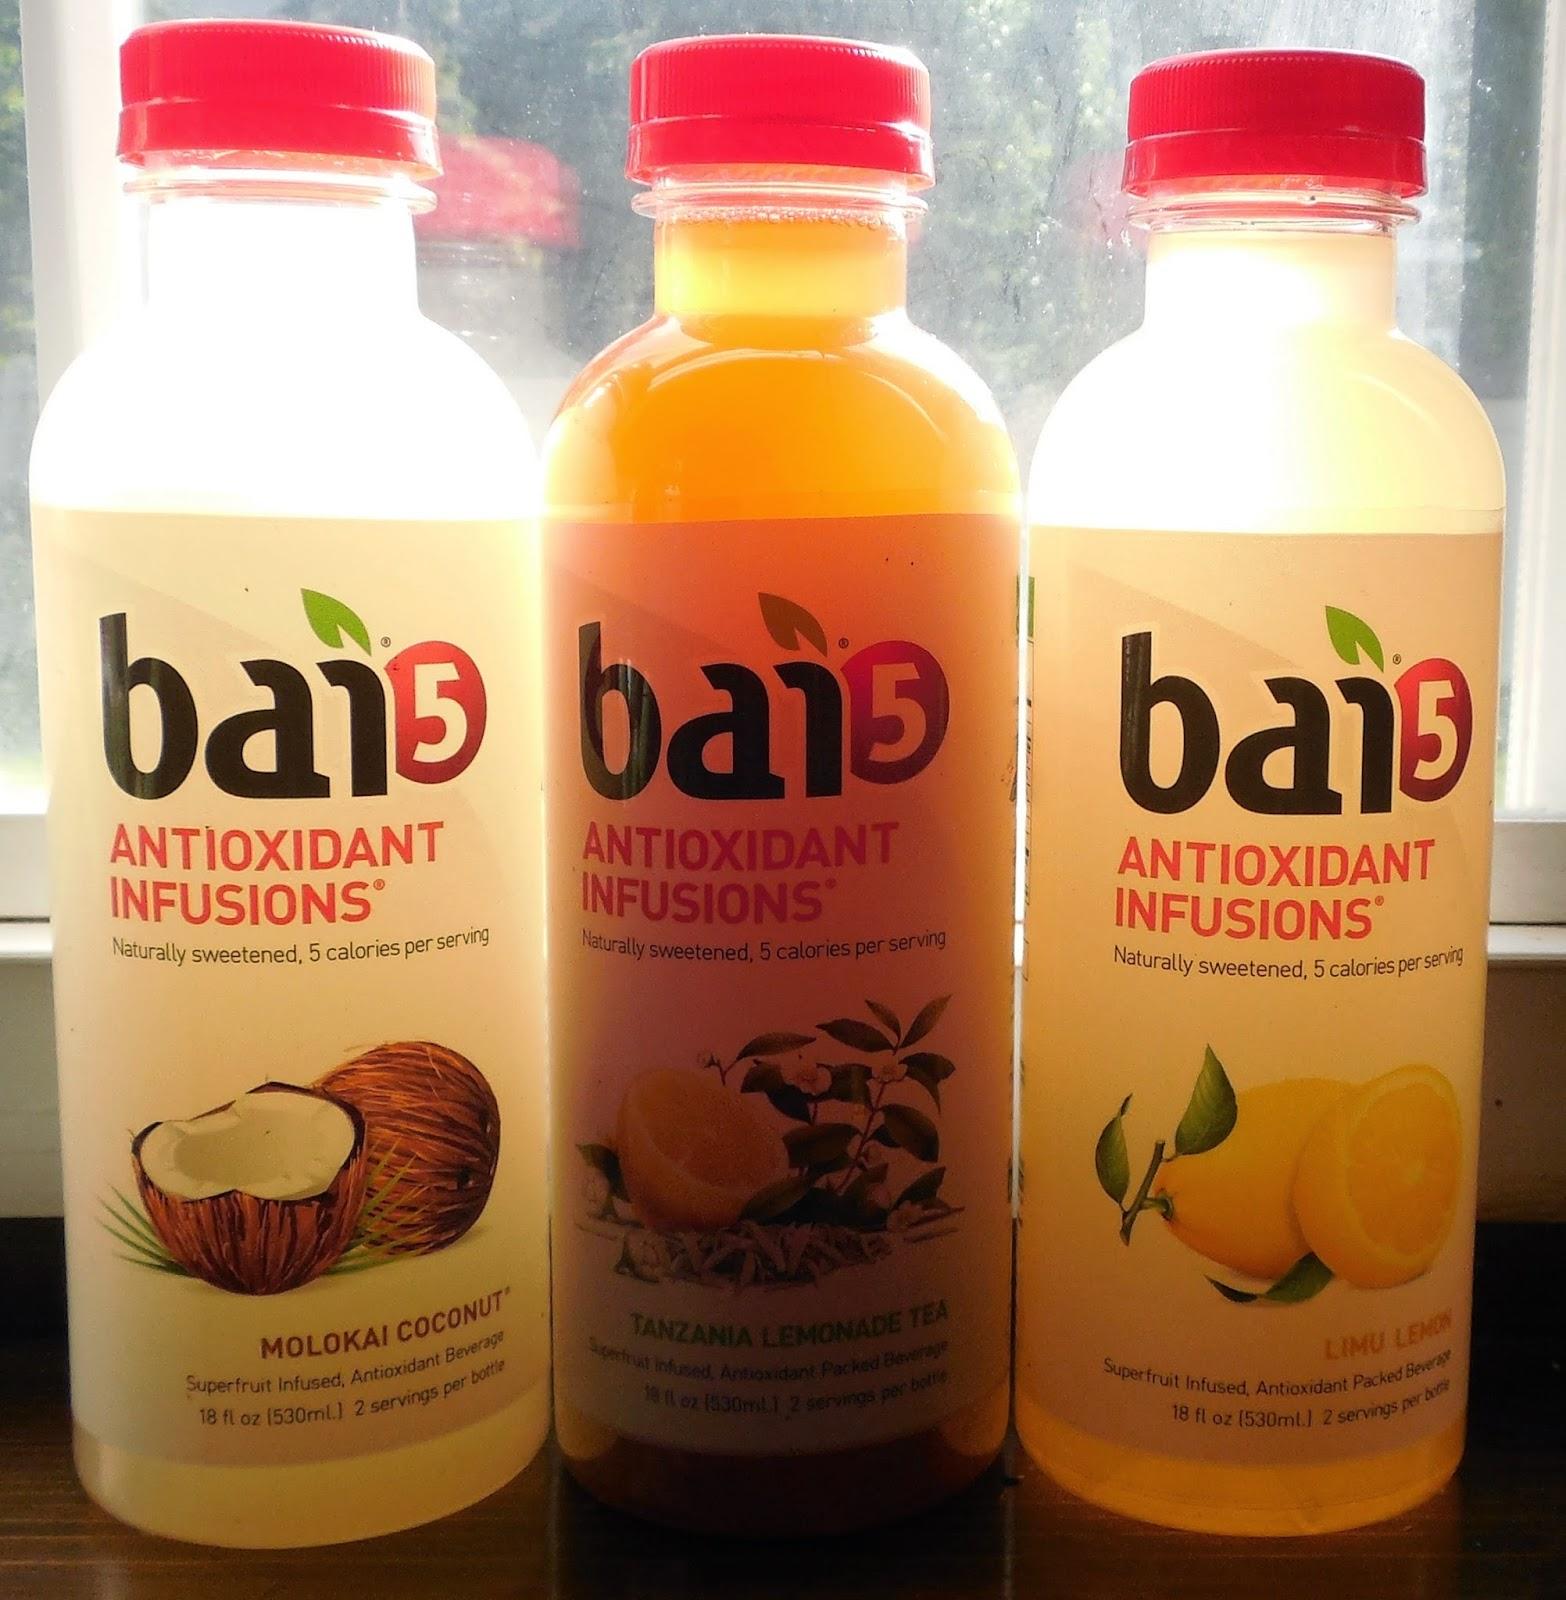 Bai5 Drink